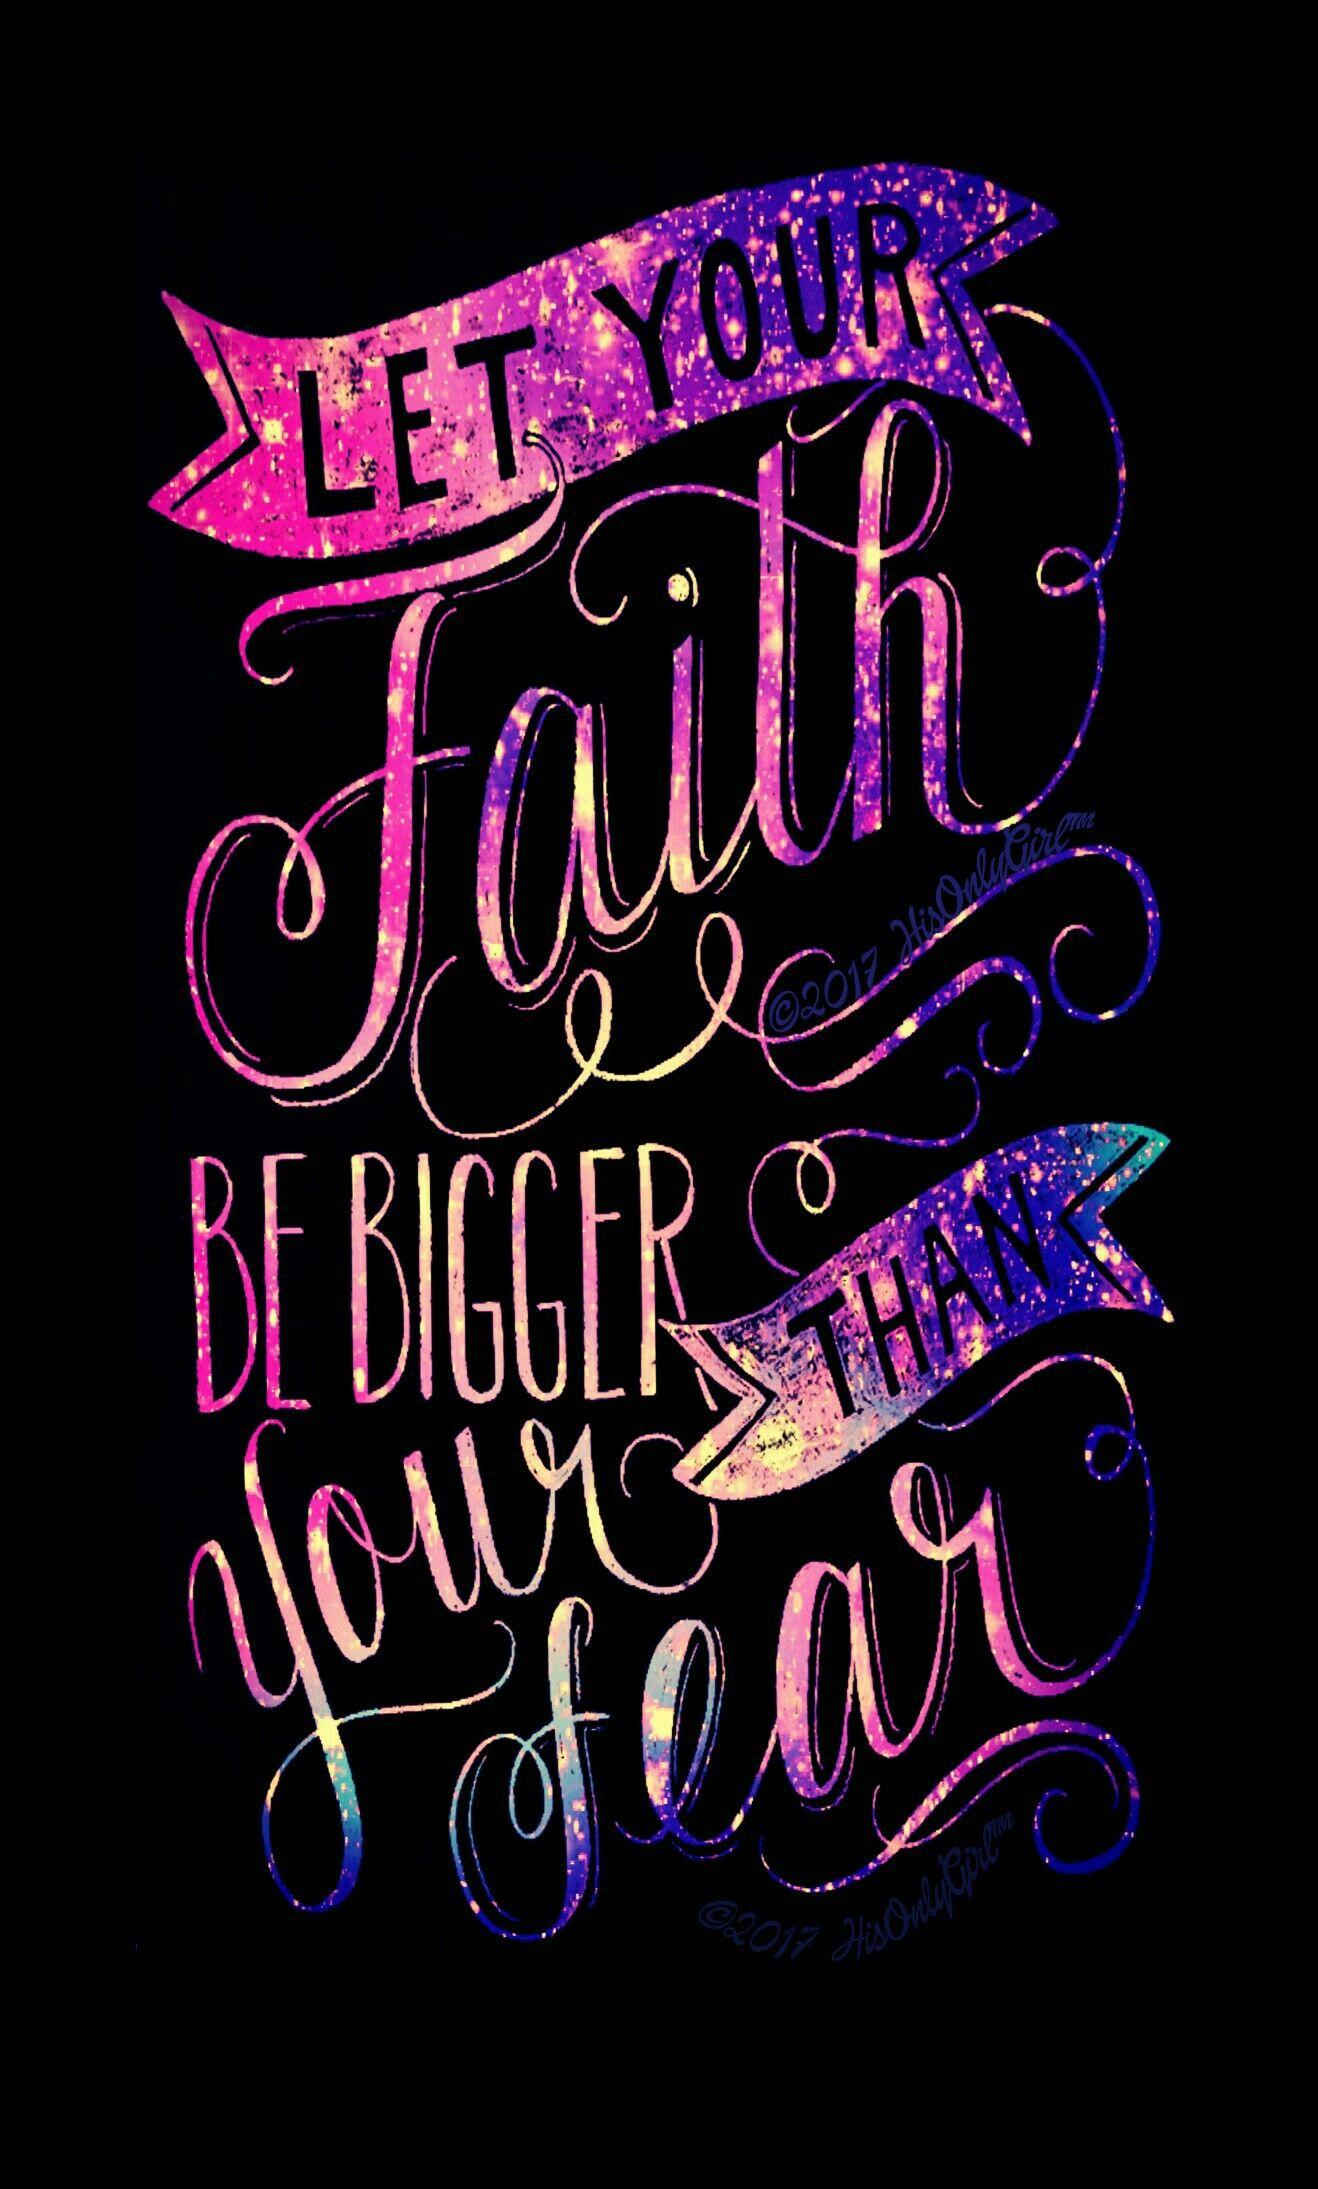 FAITH Over FEAR Galaxy Wallpaper I Created For The App CocoPPa